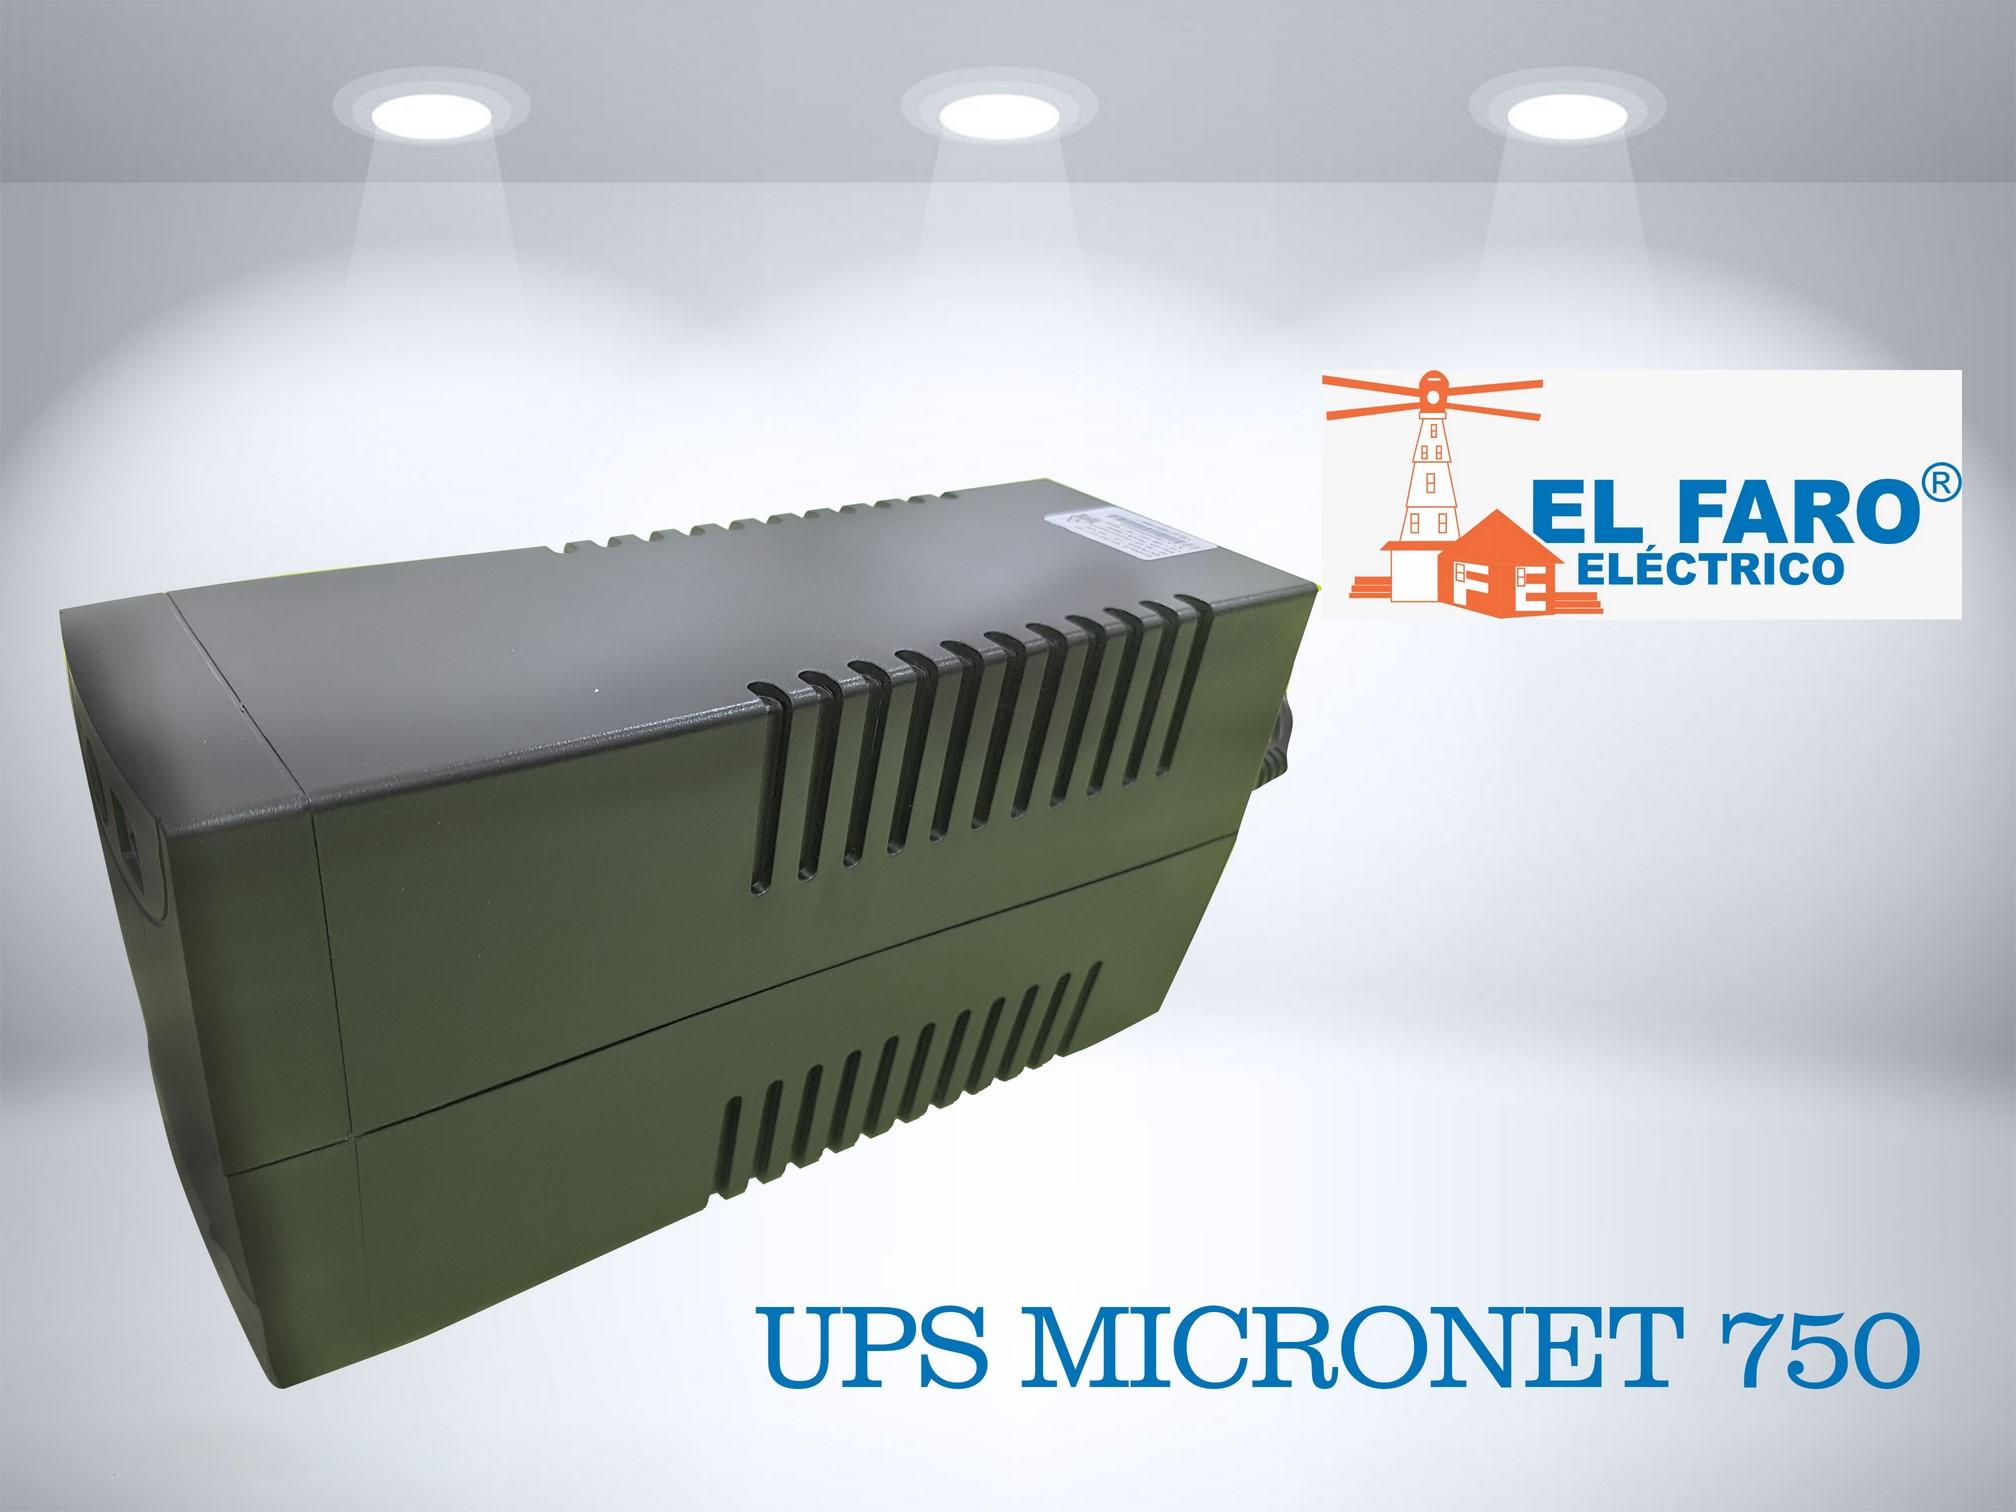 UPS Micronet 750